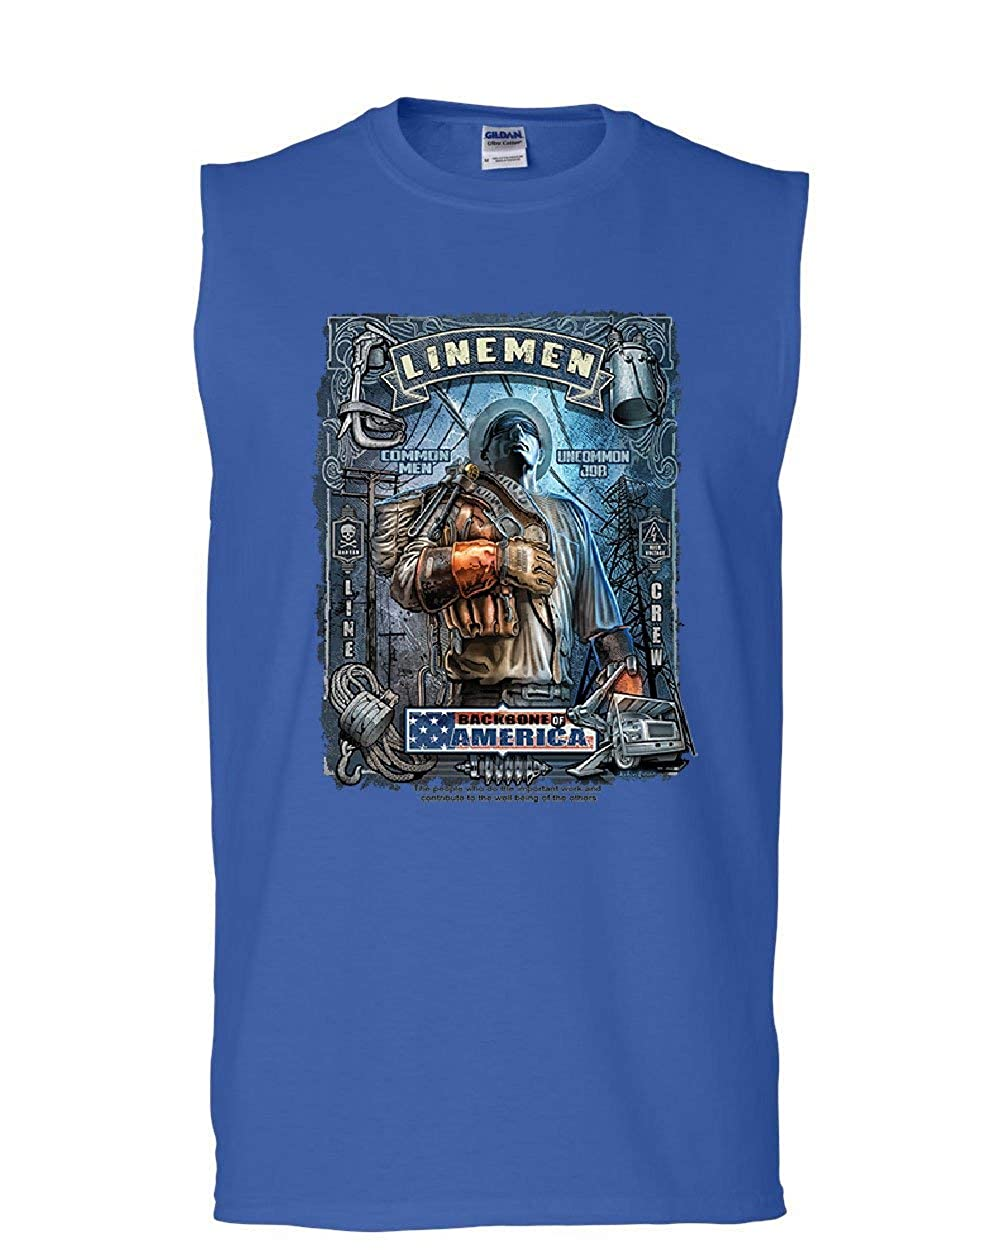 Linemen Backbone of America Muscle Shirt Lineworker Blue Collar Work Sleeveless